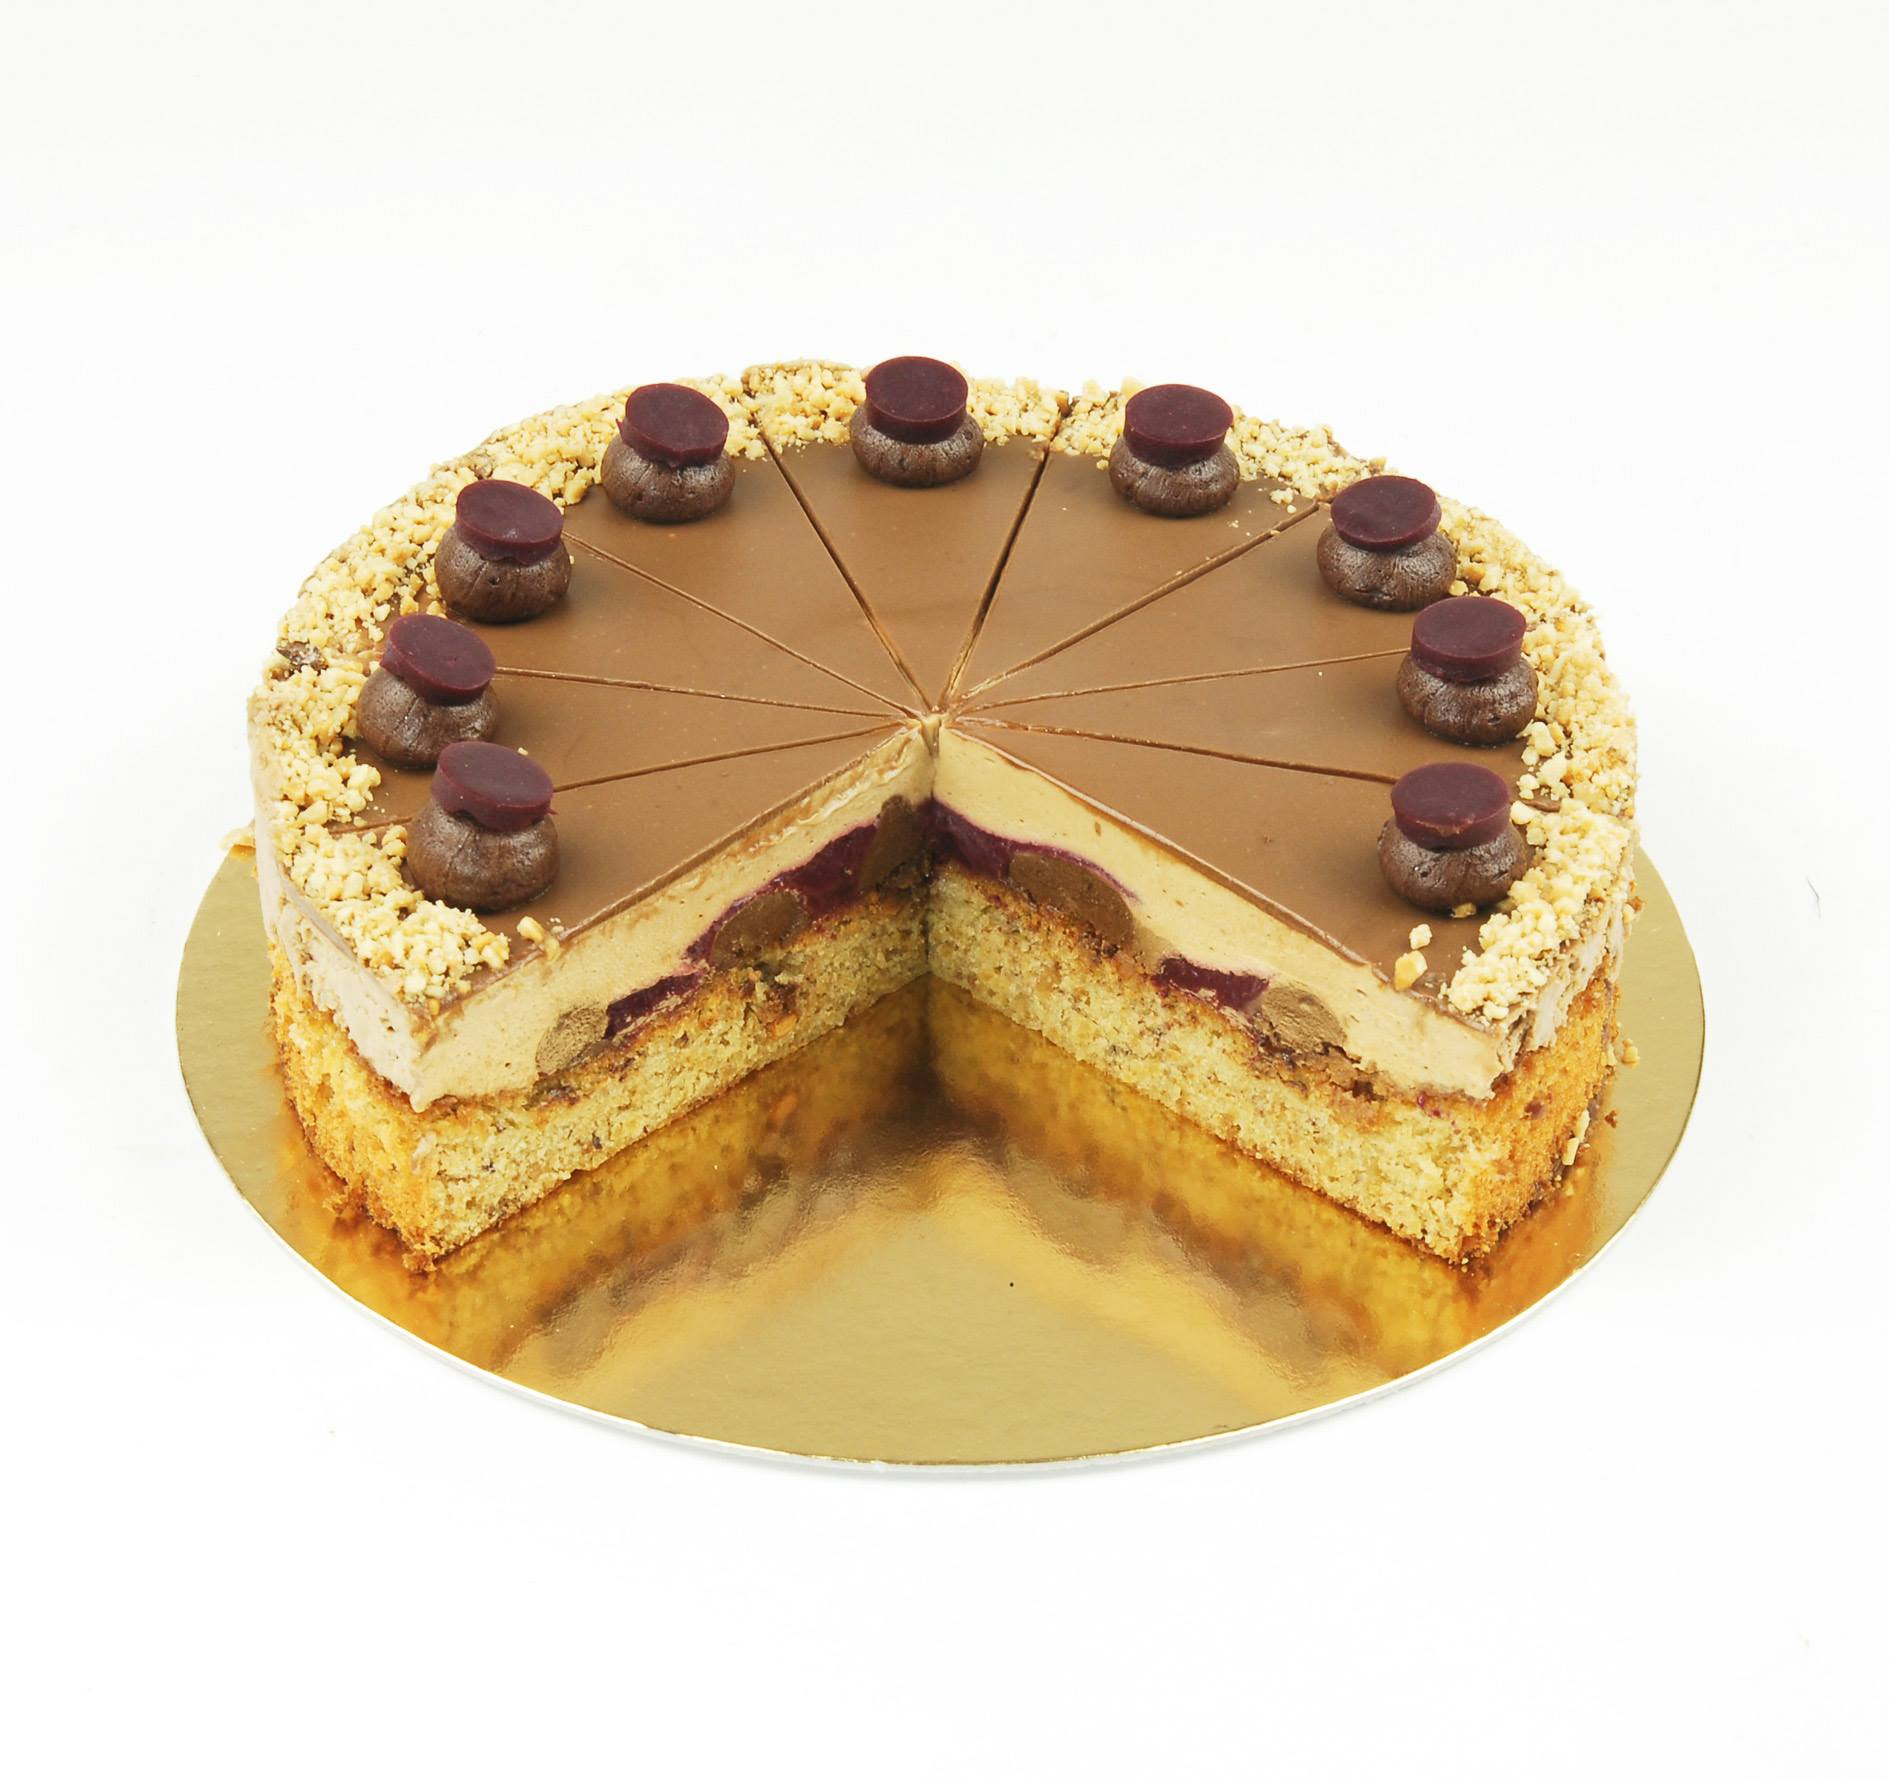 Balatoni habos mogyoró torta